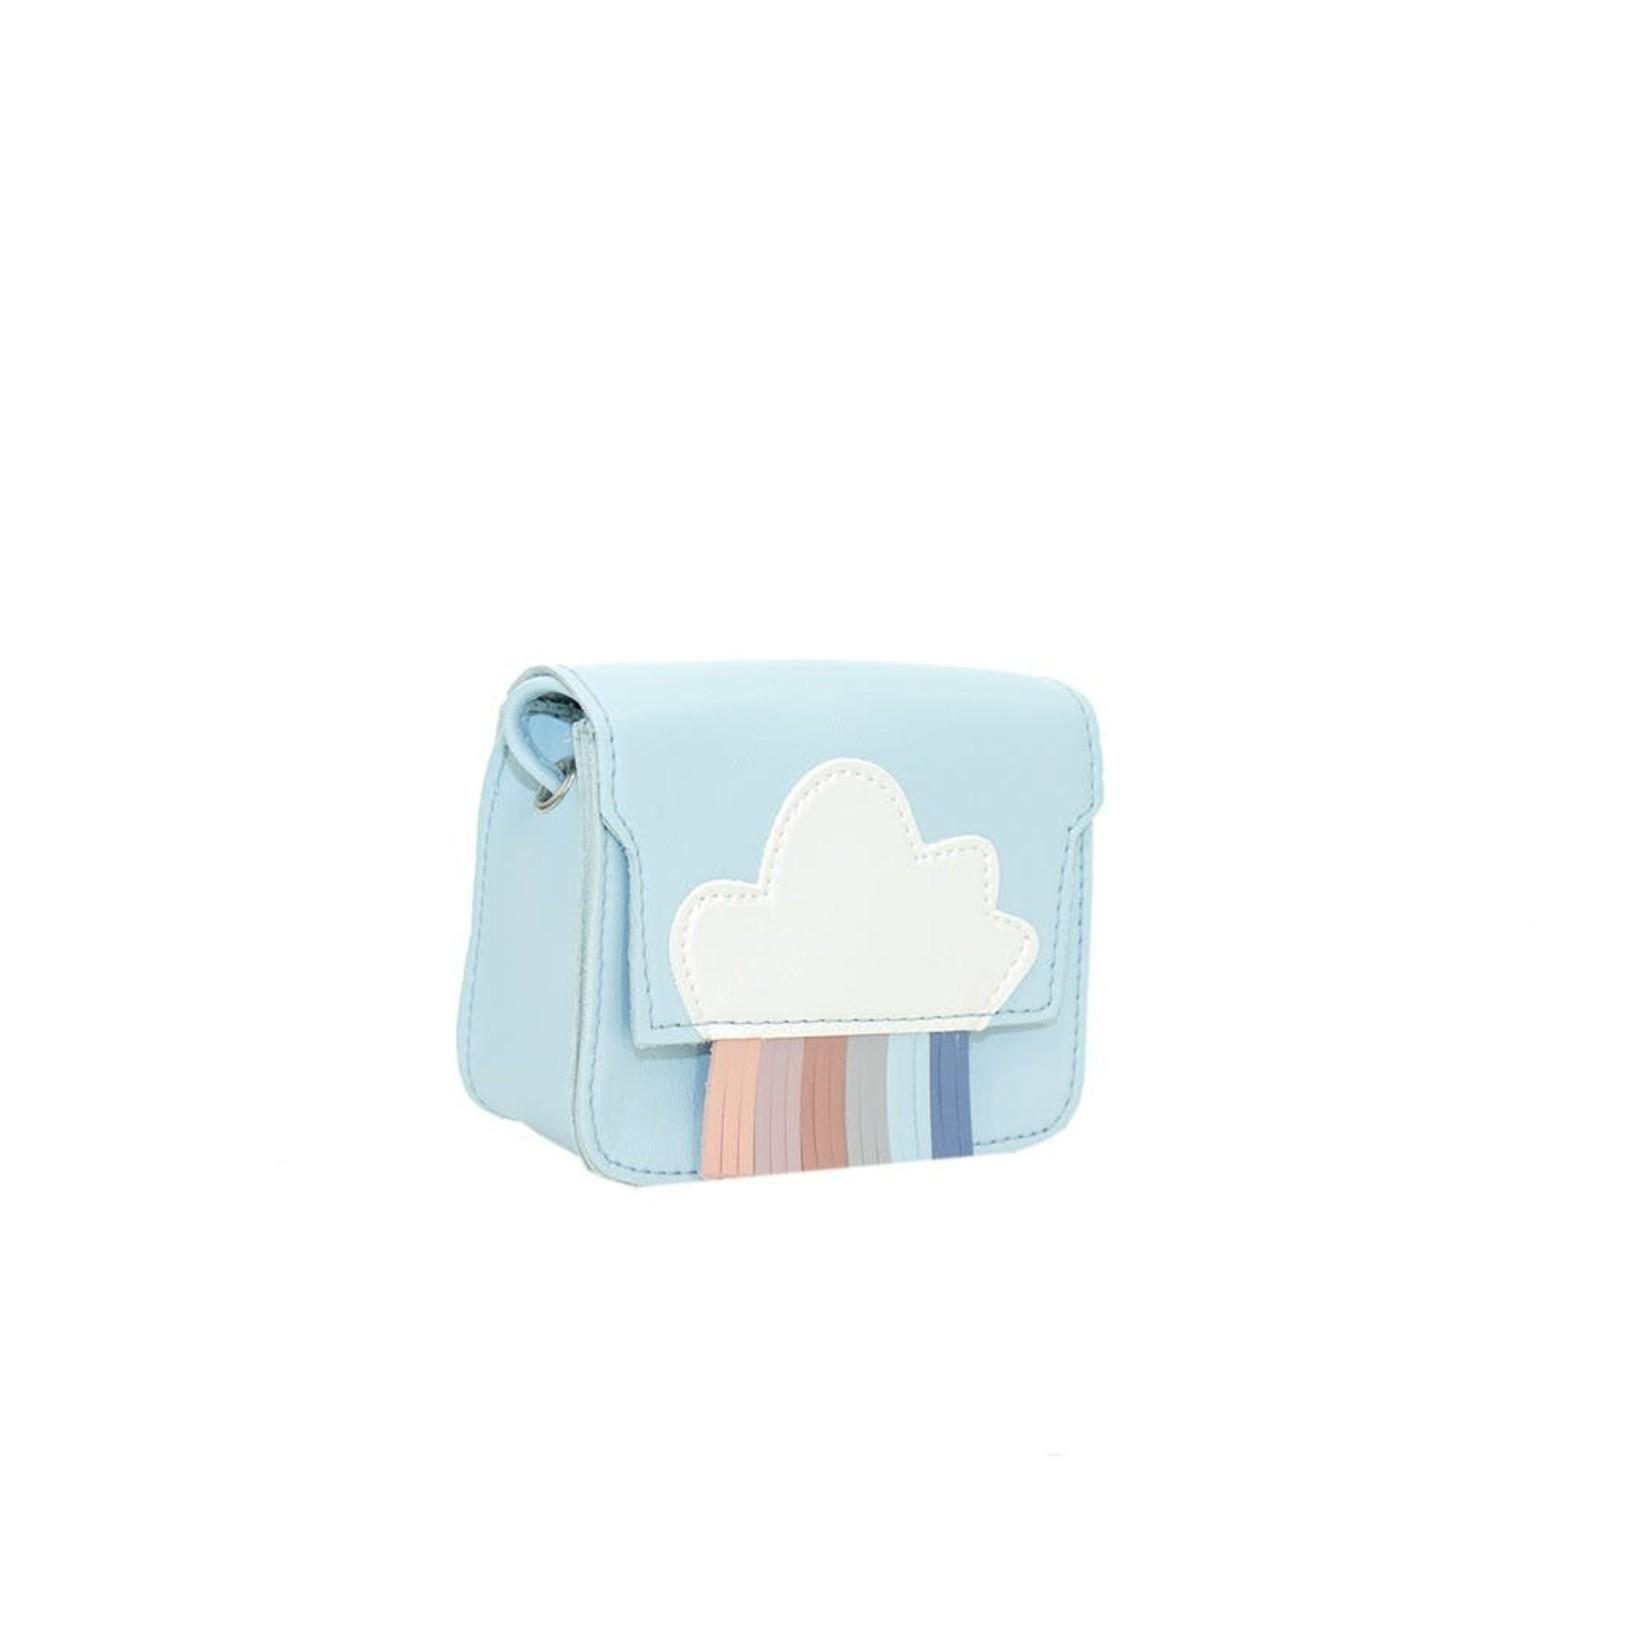 Yuko B Handtas Mini Regenboog Blauw